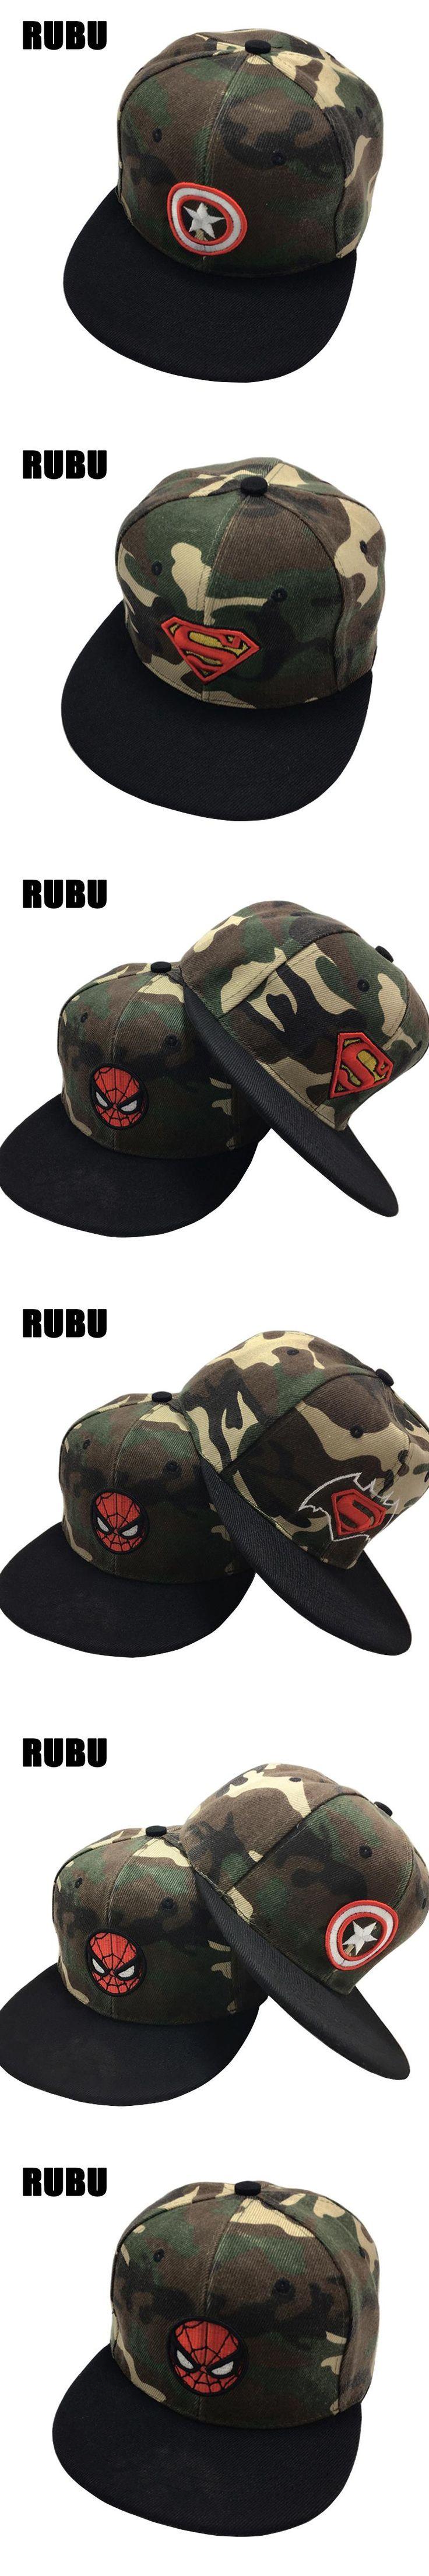 Kids Baseball Caps Fashion Superman Batman Children Snapback Caps Gorras Planas Boys Hip Hop Hat Camo cap kids sun hats for boys